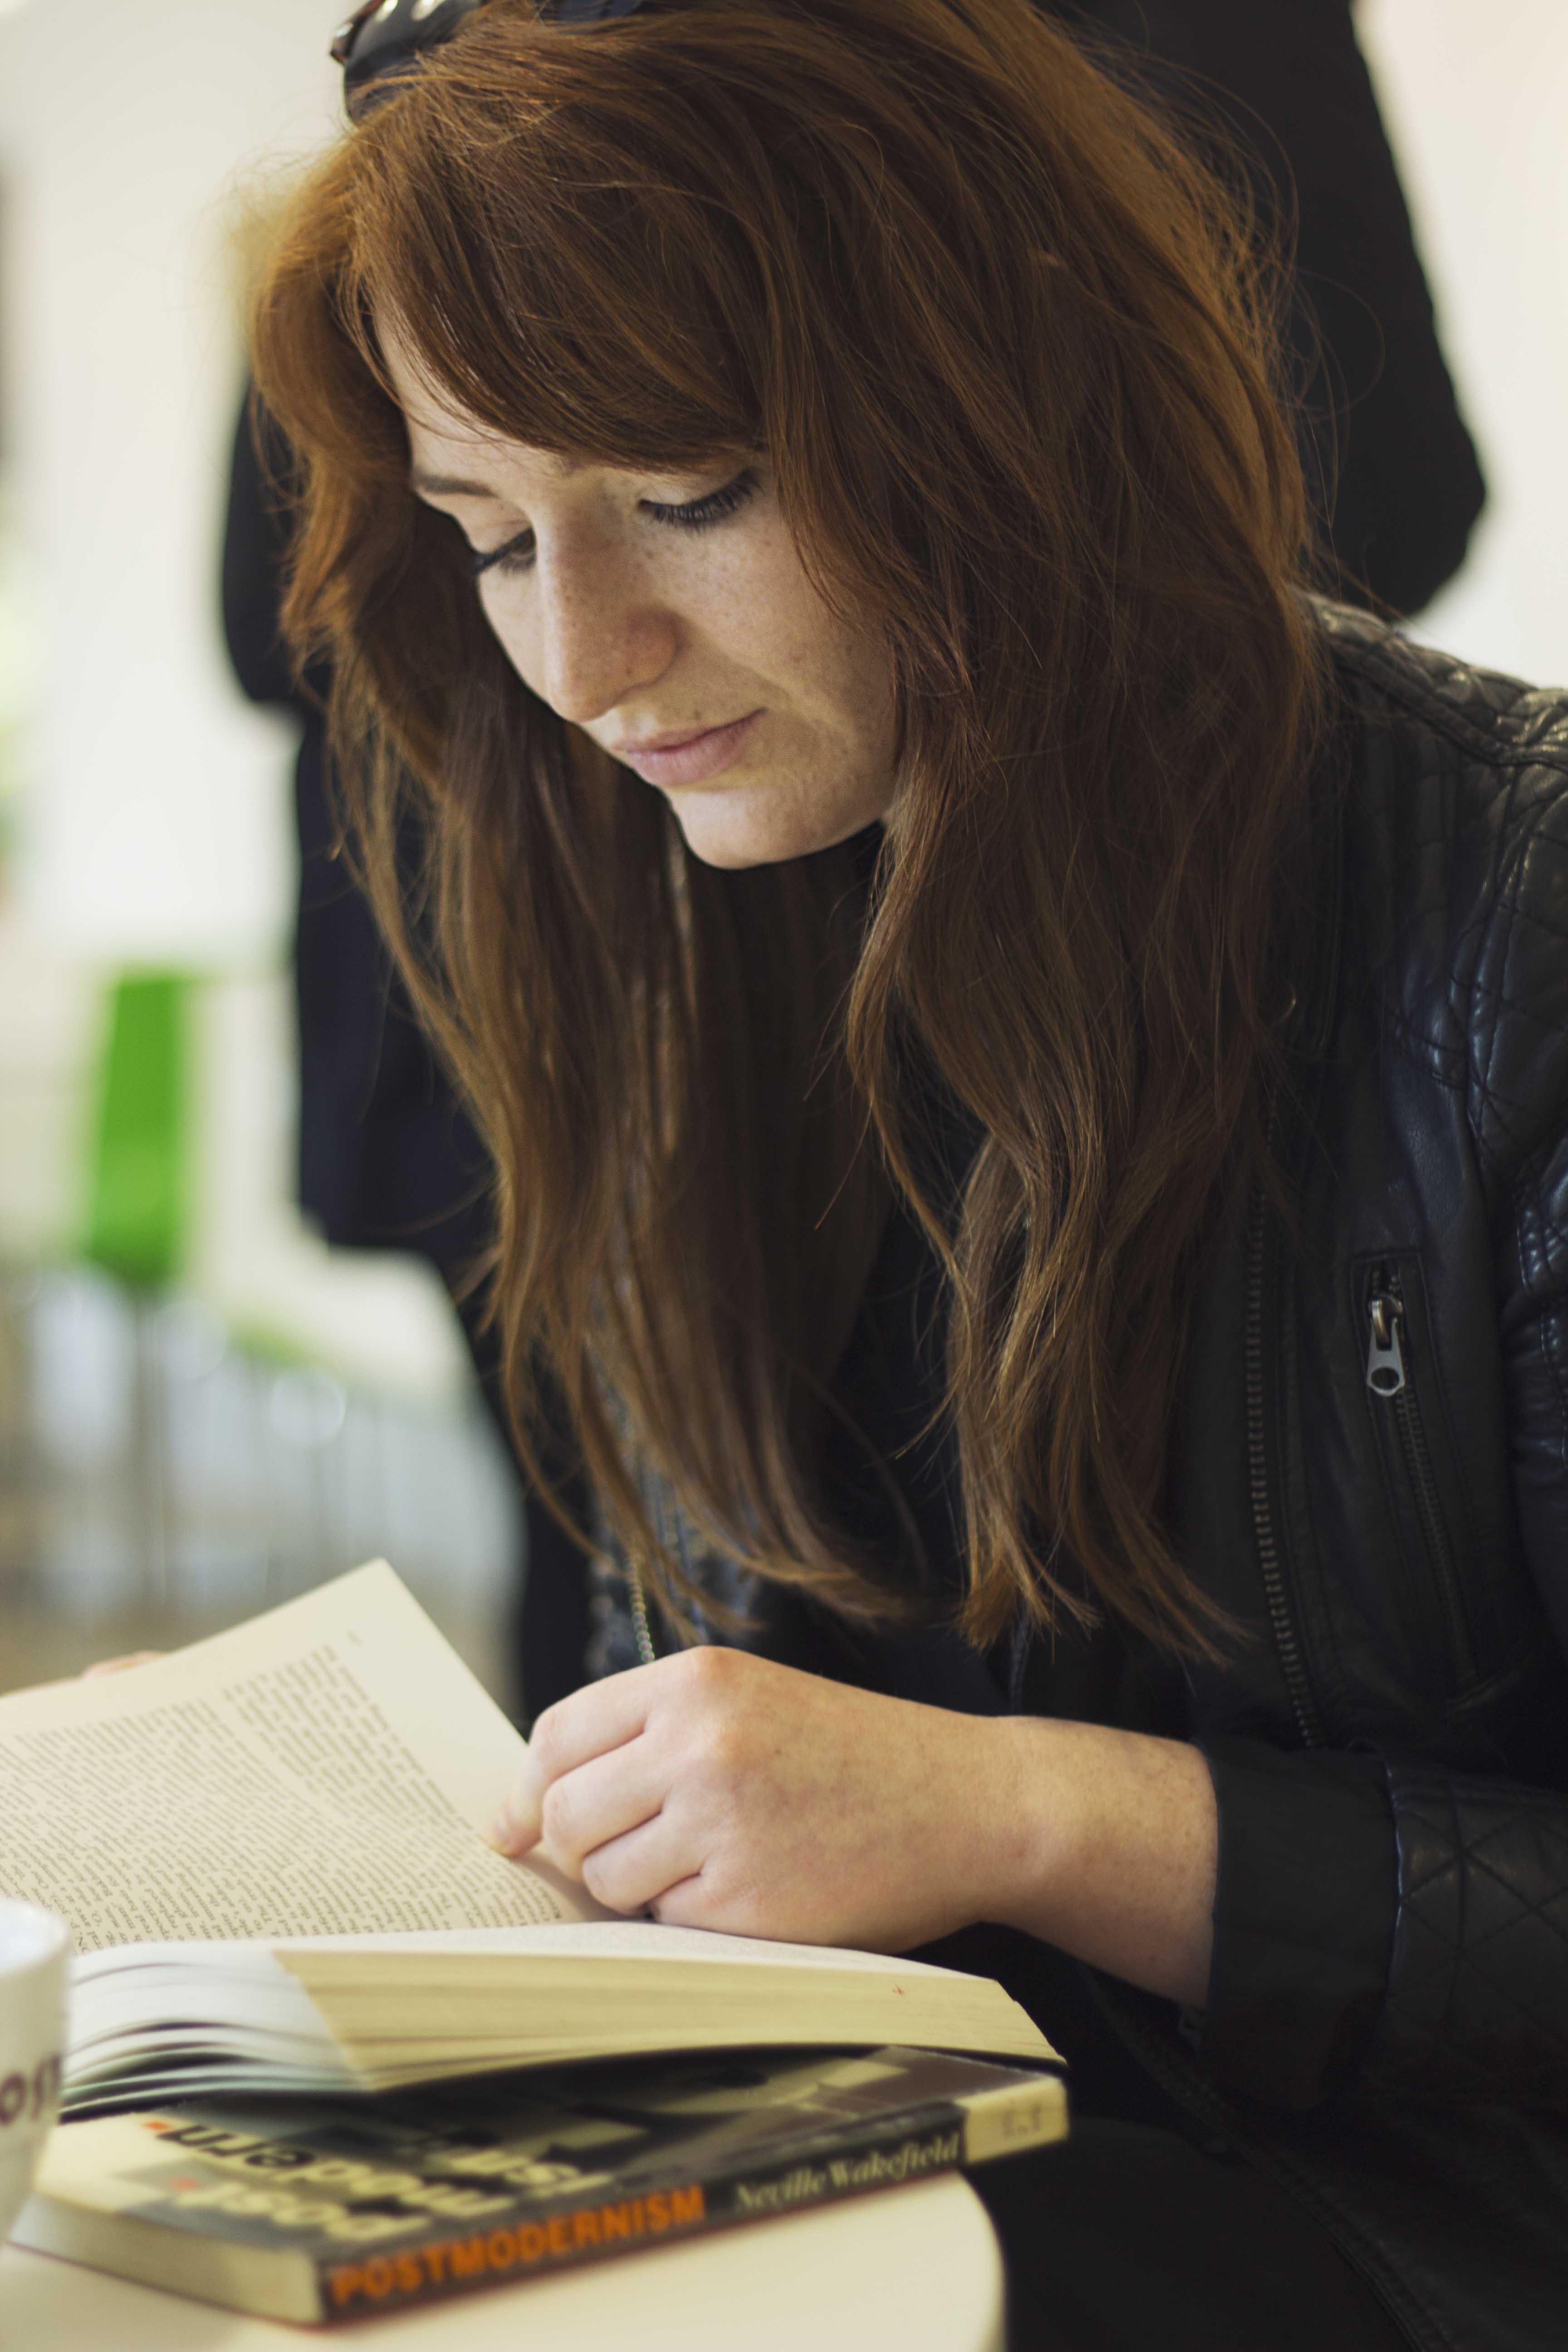 english literature and creative writing degree